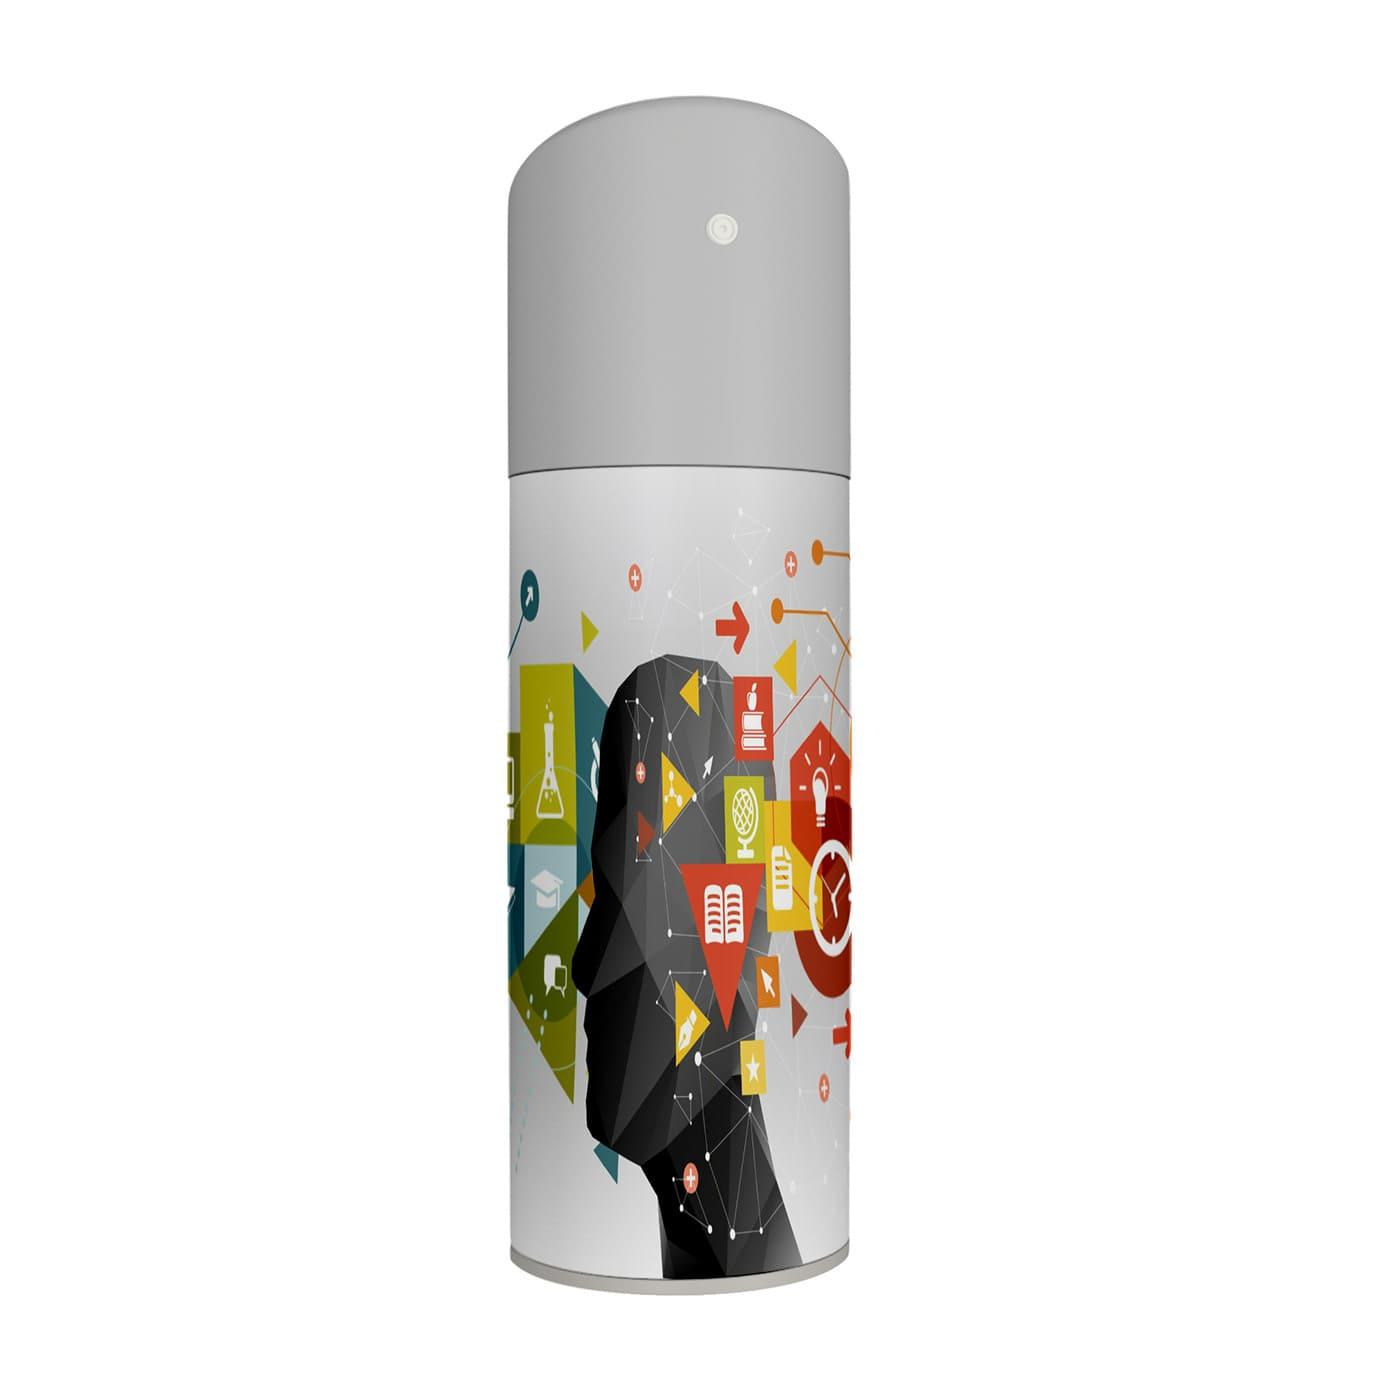 Free Perfume Bottle Mockup